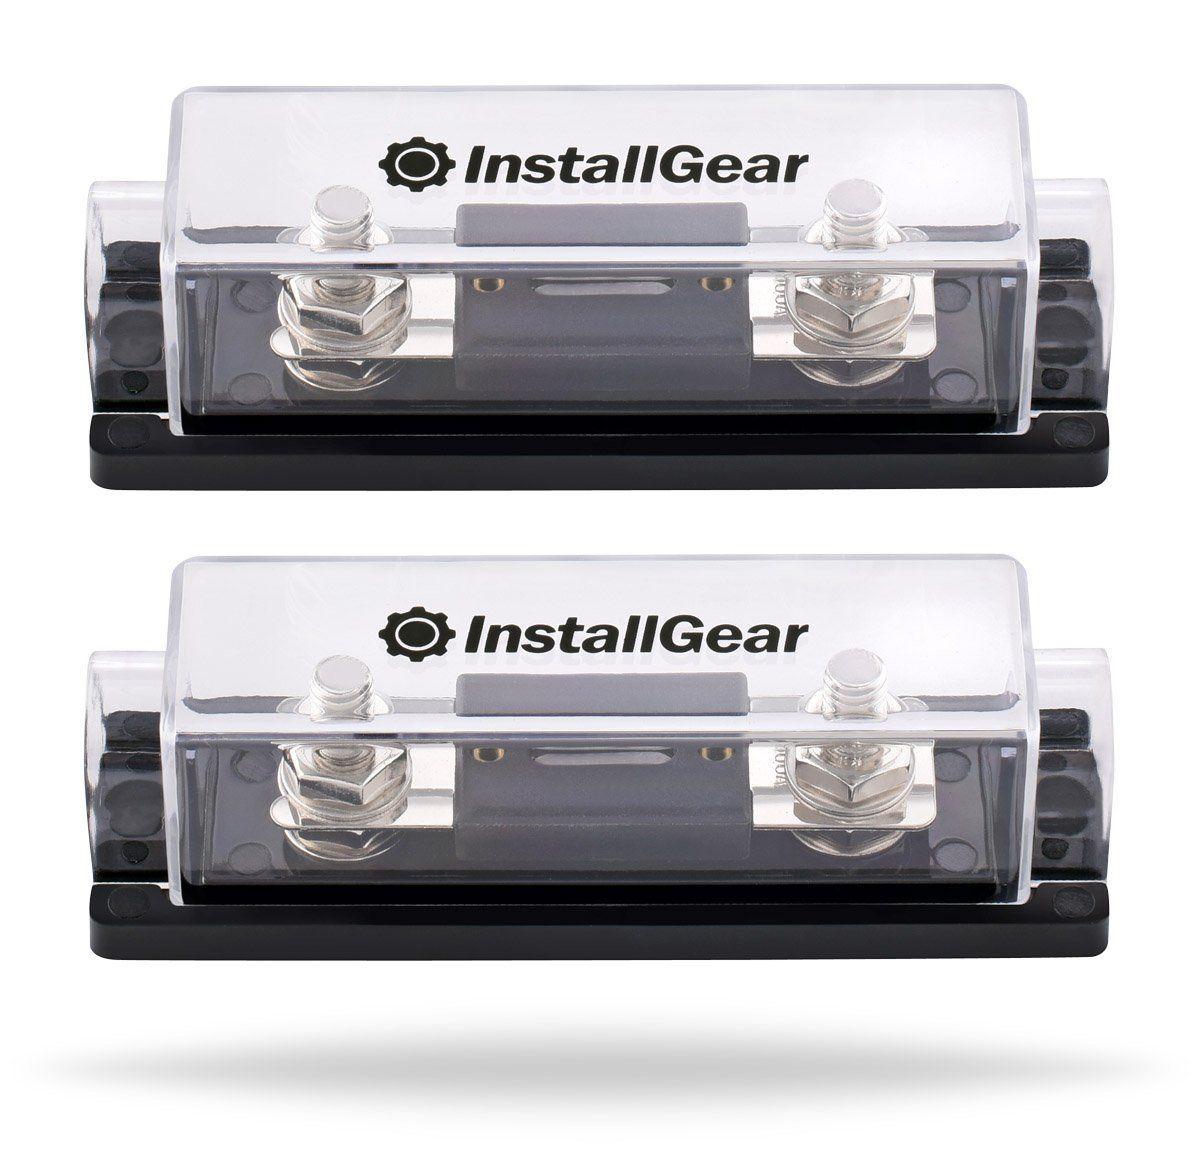 installgear 0 2 4 gauge ga anl fuse holder 100 amp anl fuses 2 pack  [ 1200 x 1166 Pixel ]